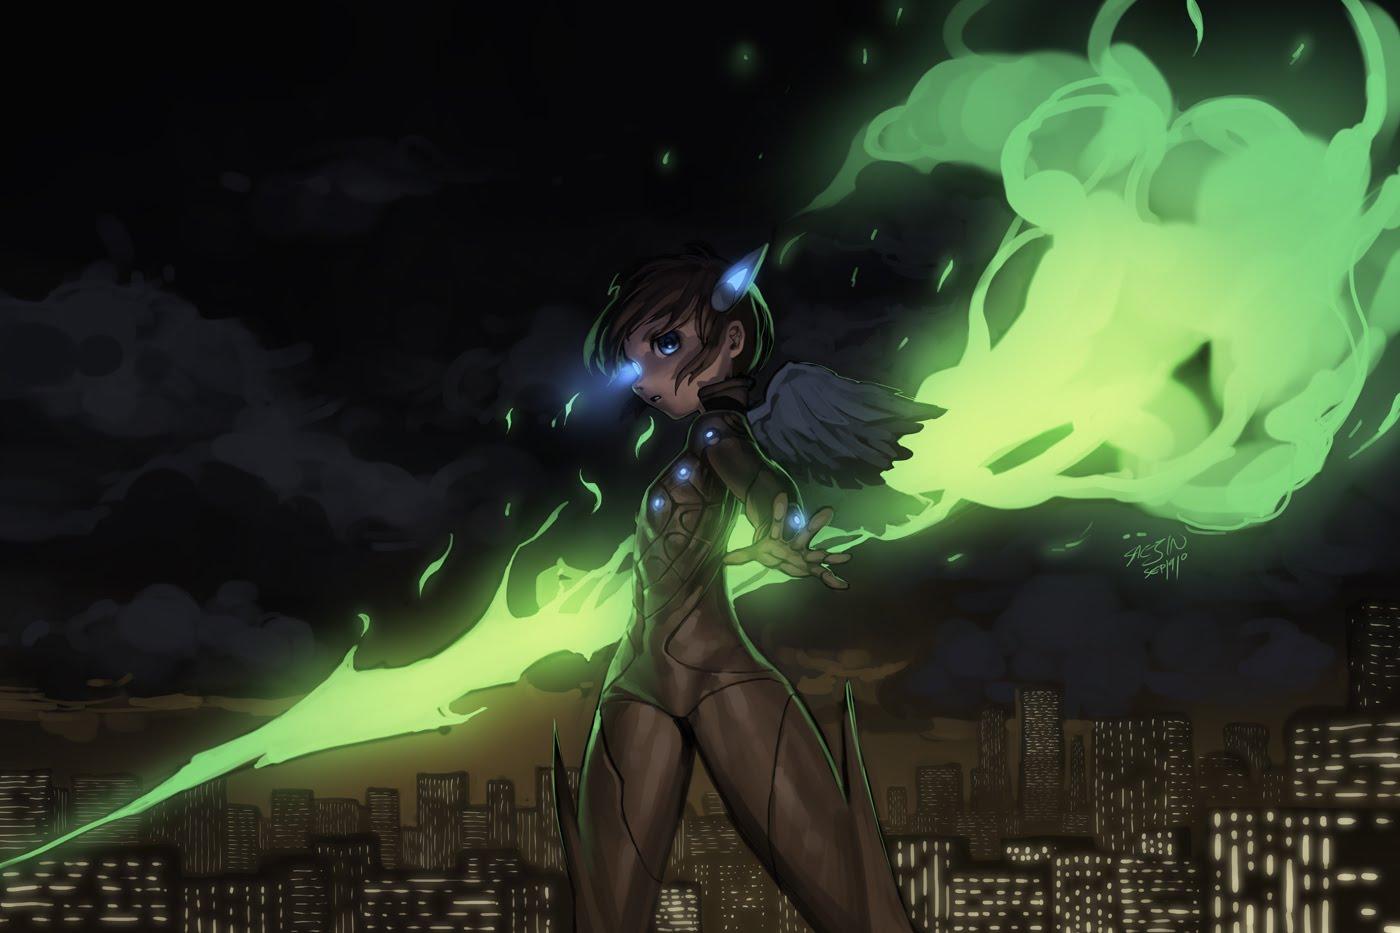 blue_eyes bodysuit brown_hair city fire night original saejin_oh short_hair skintight wings